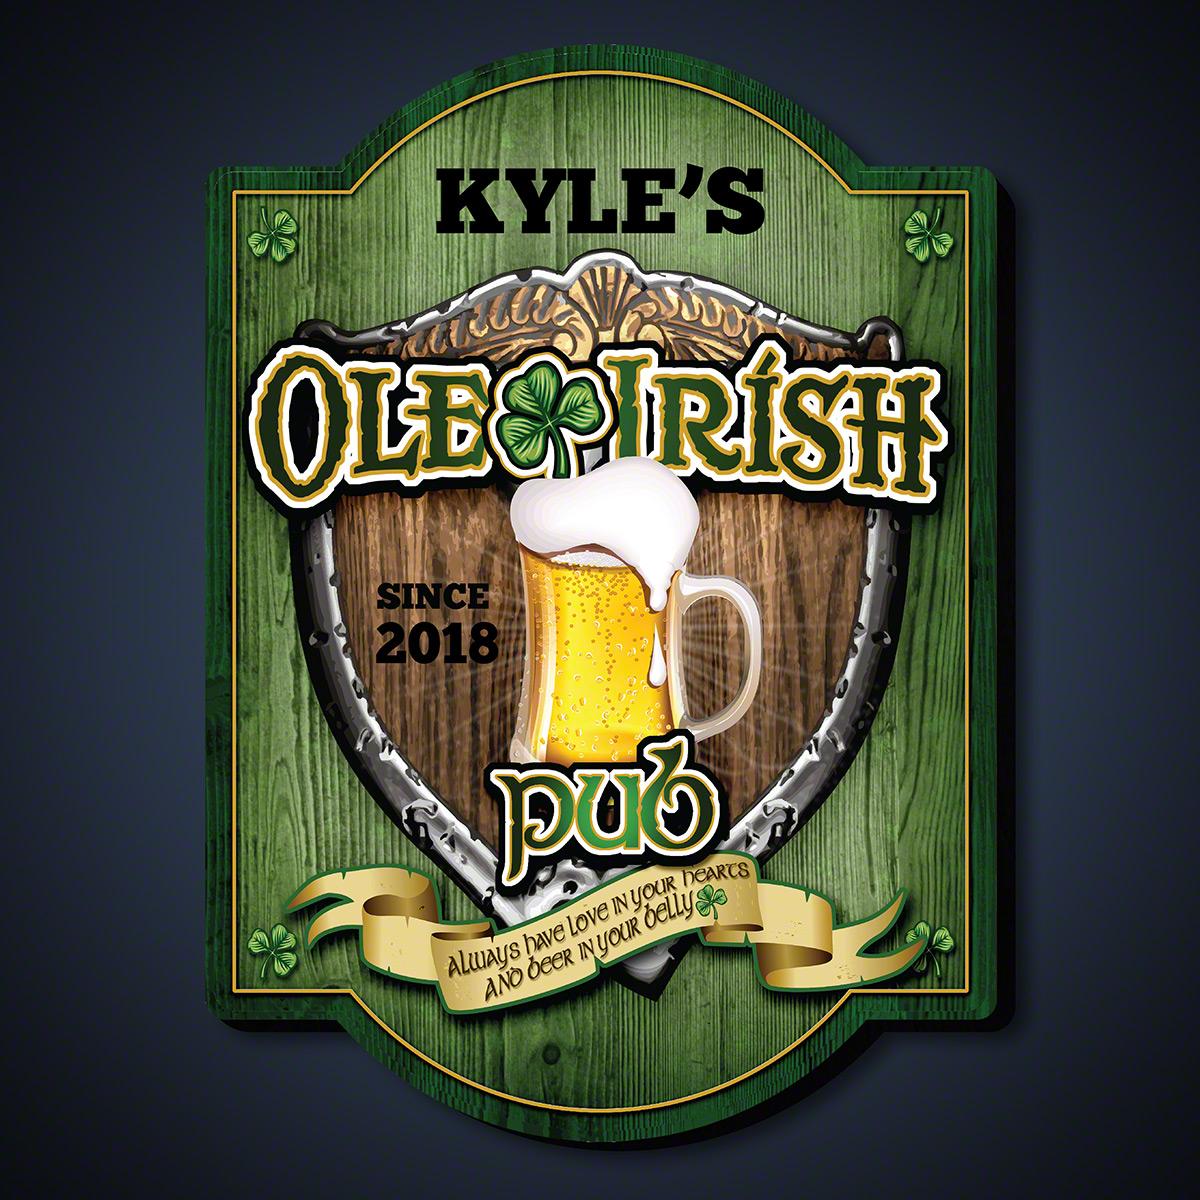 Ole-Irish-Personalized-Pub-Sign